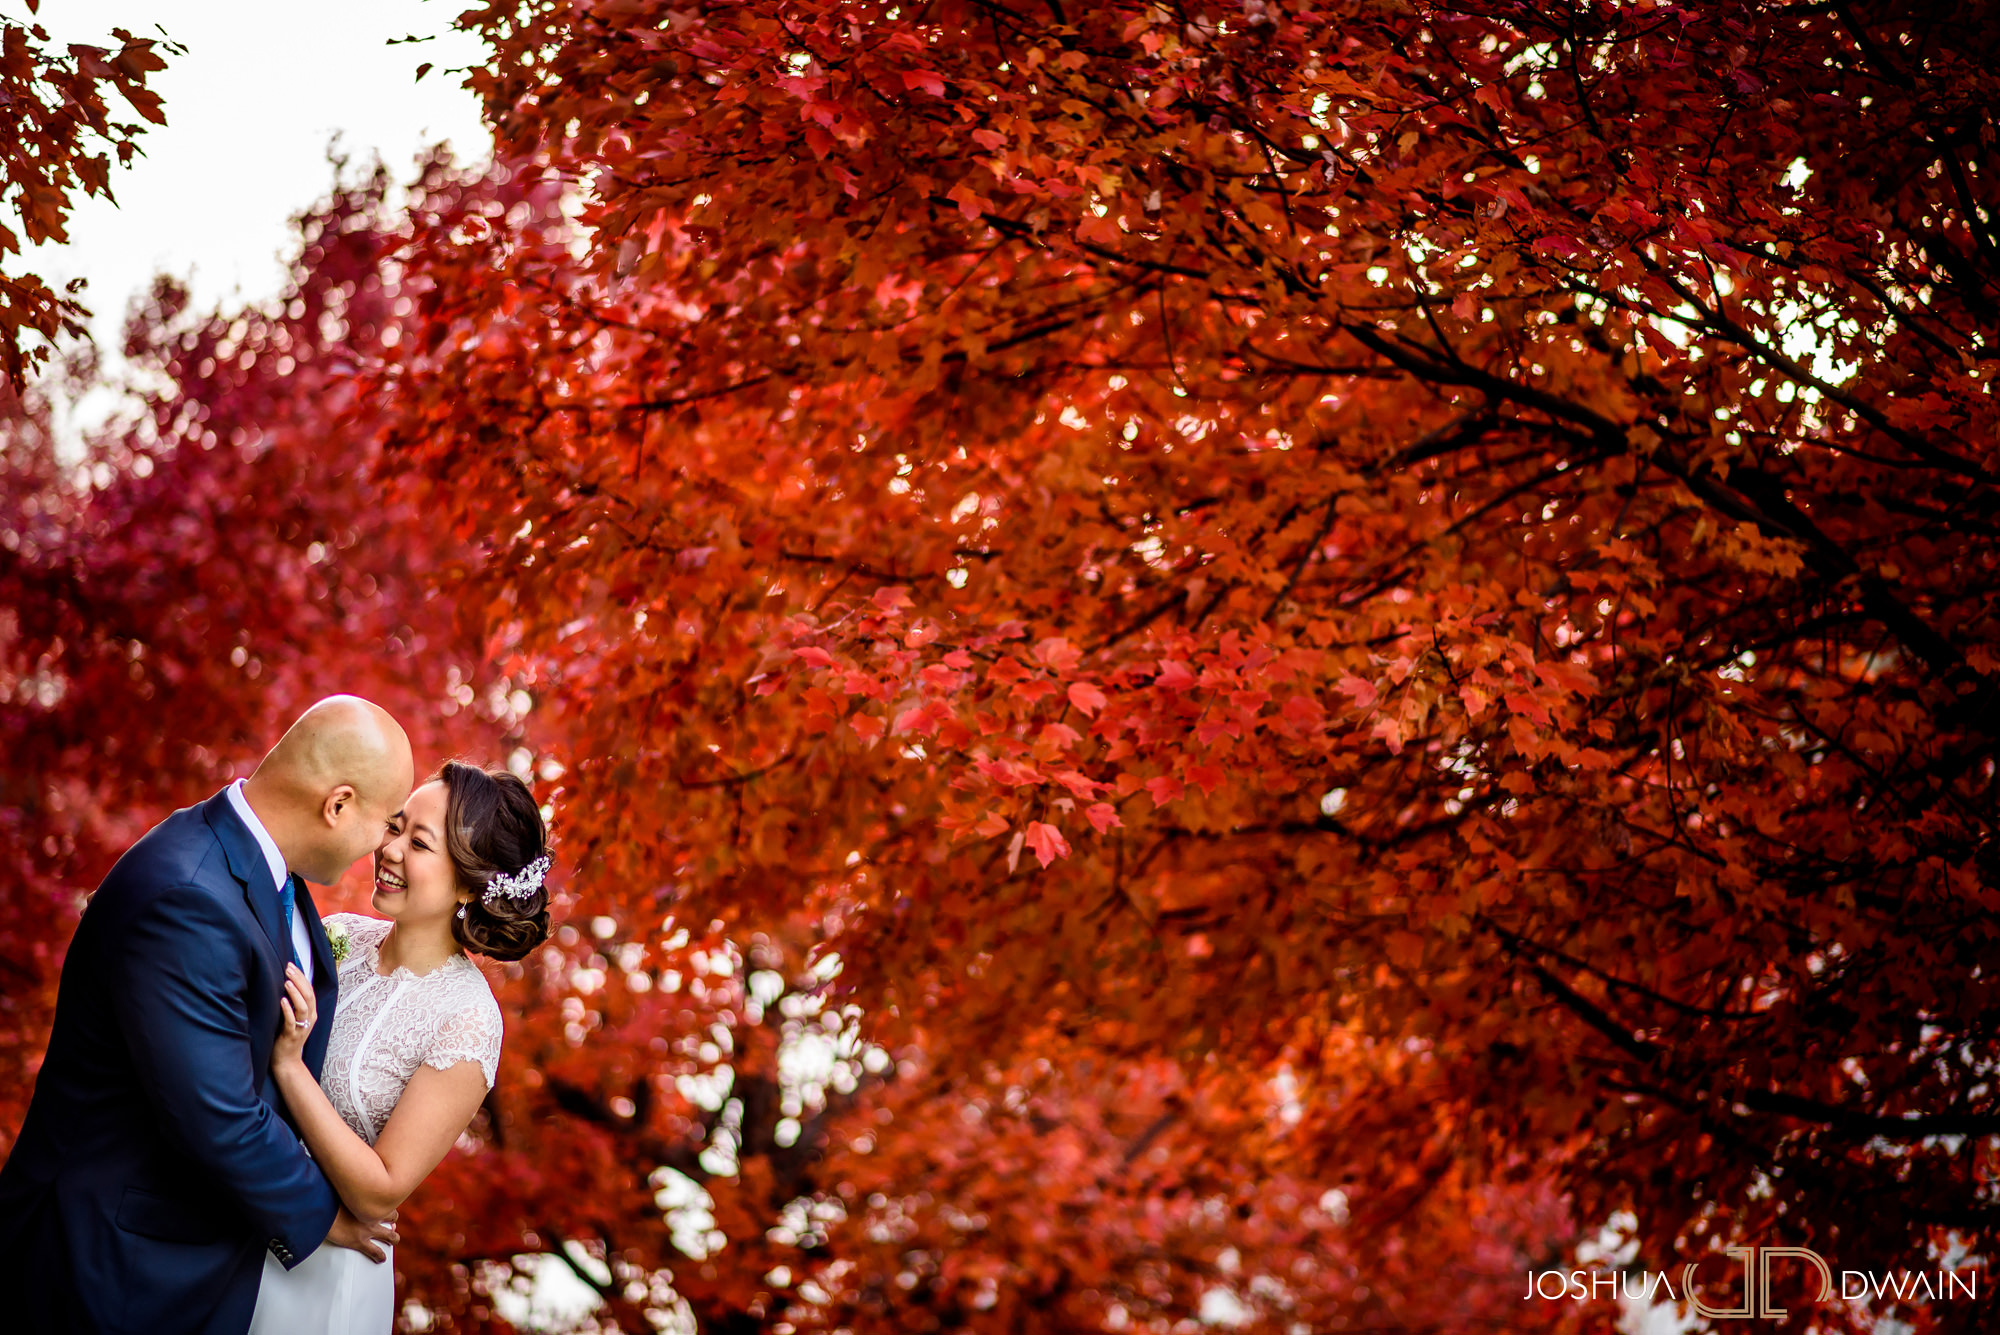 yanshu-michael-28-somerset-courthouse-elopement-wedding-joshua-dwain